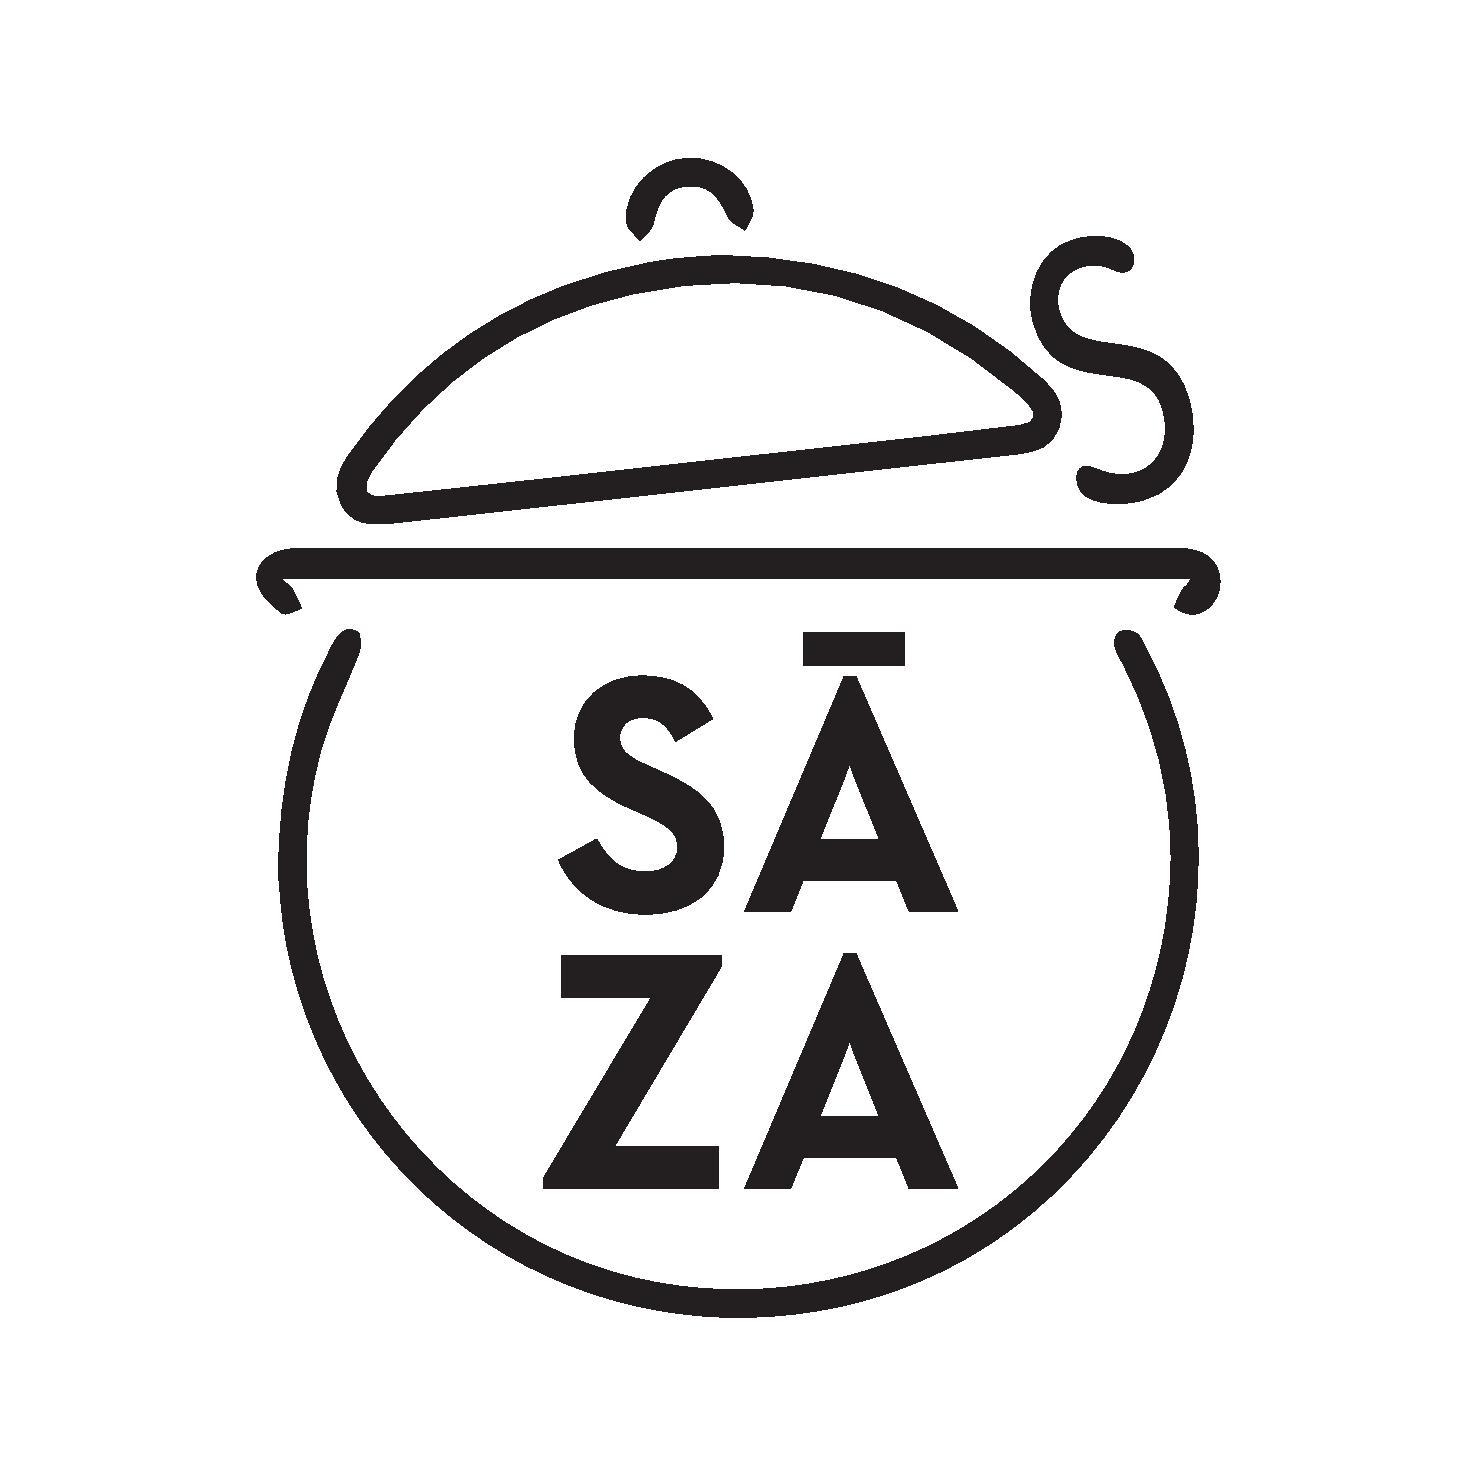 Saza Chutney, Sauces & More